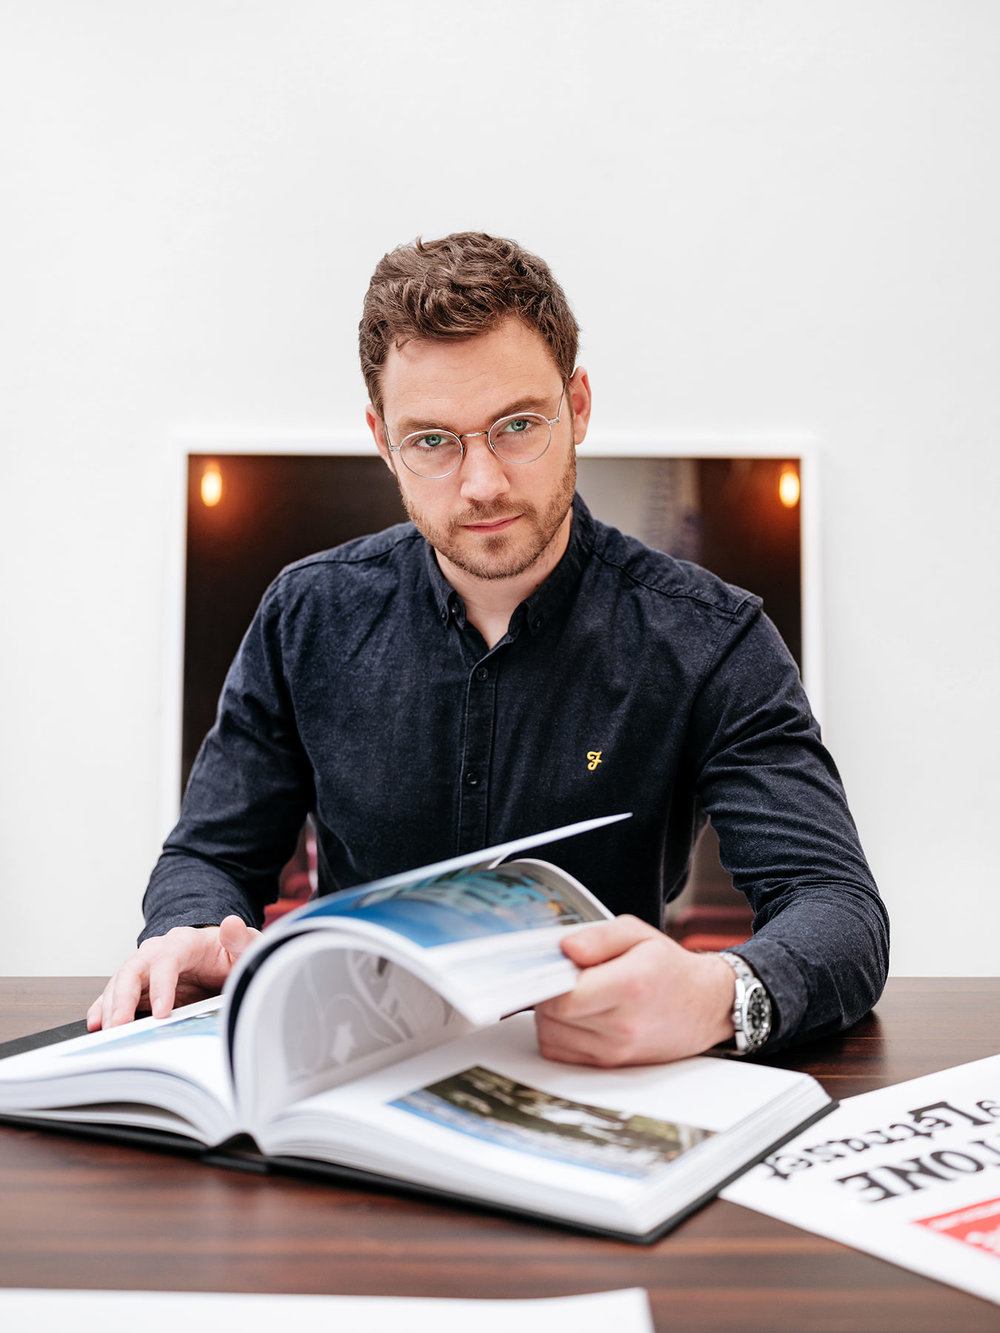 Alexandre Pugin, graphic designer & founder of The Workshop, Geneva, Switzerland.